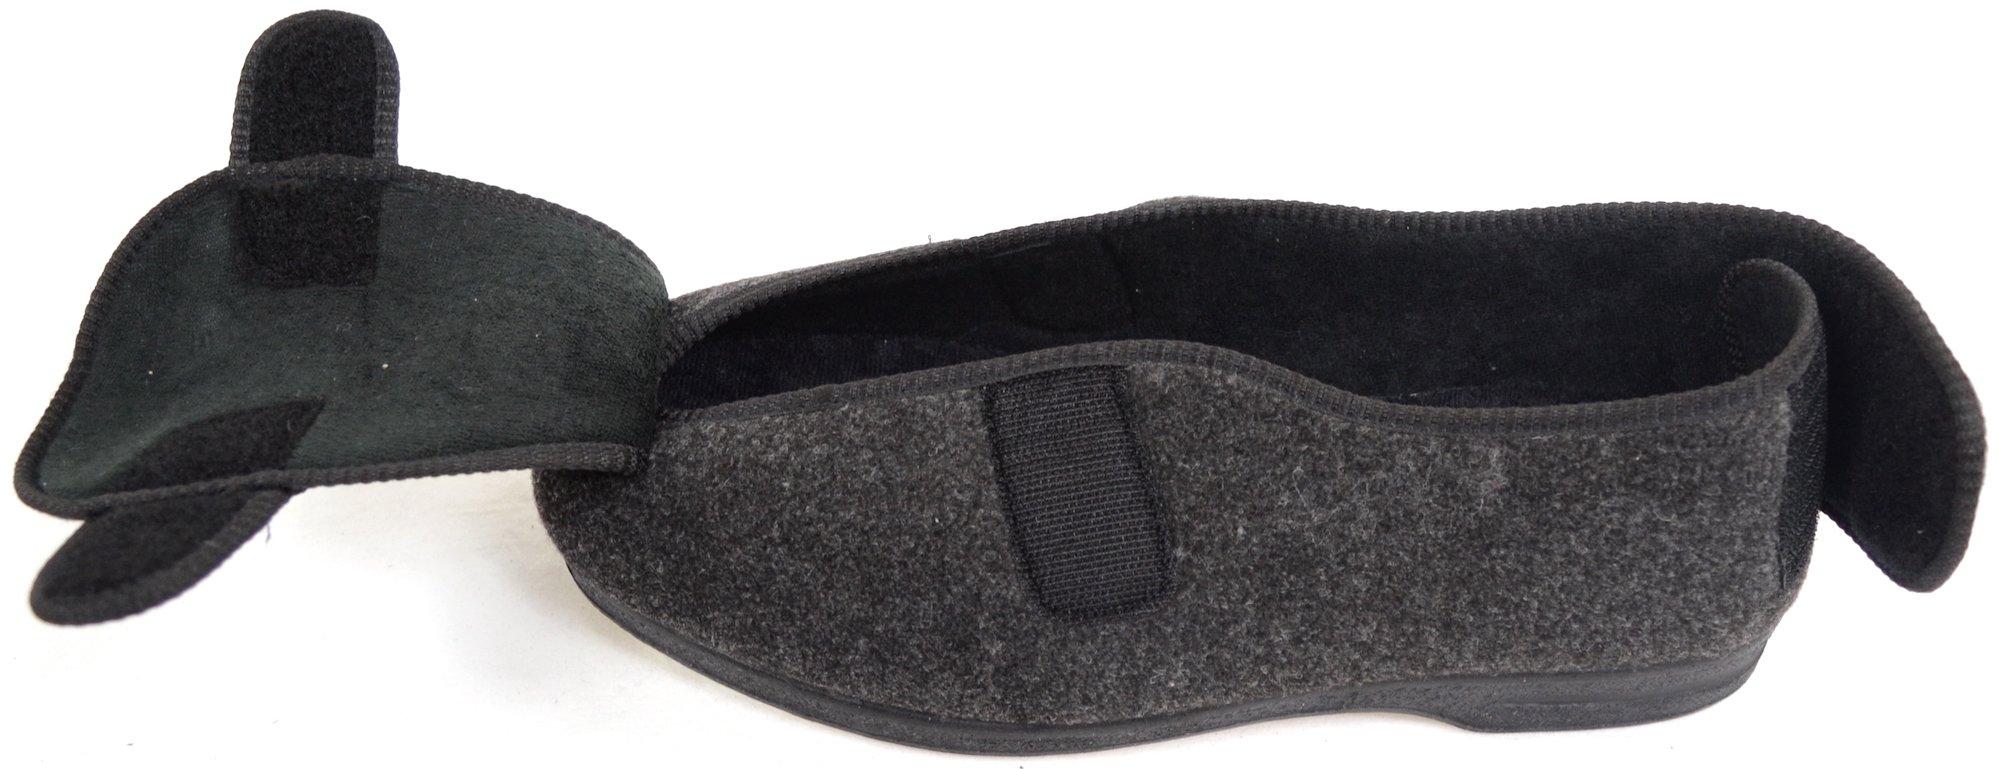 ABSOLUTE FOOTWEAR Mens Orthopaedic/Extra Wide Fit Adjustable Slipper Boot/Slippers - Grey - 10 US by ABSOLUTE FOOTWEAR (Image #8)